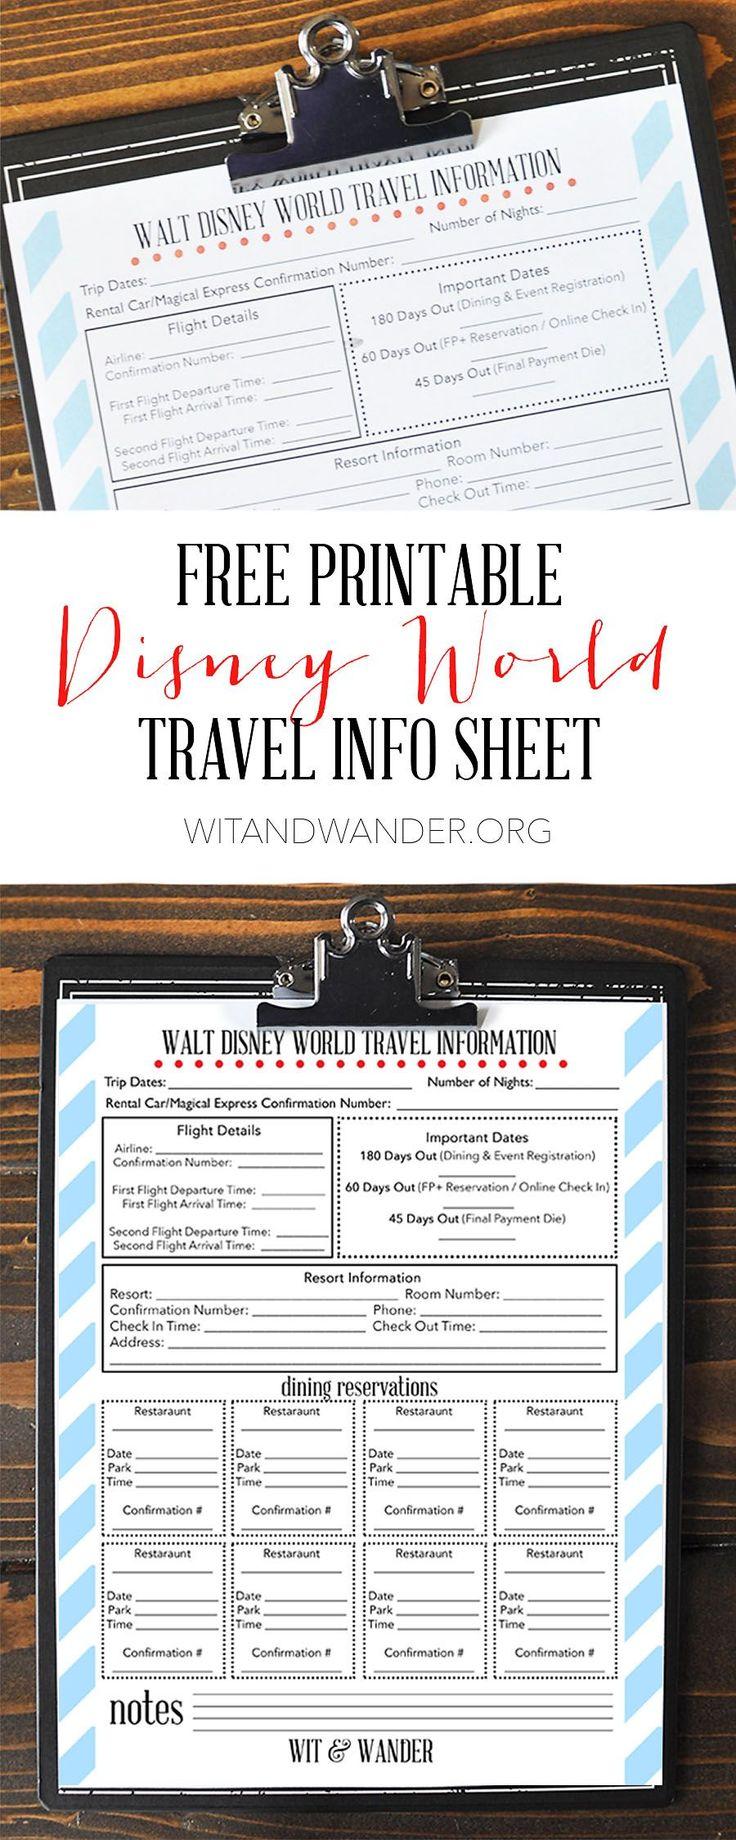 Printable Disney World Travel Info Sheet - Wit & Wander Pinterest